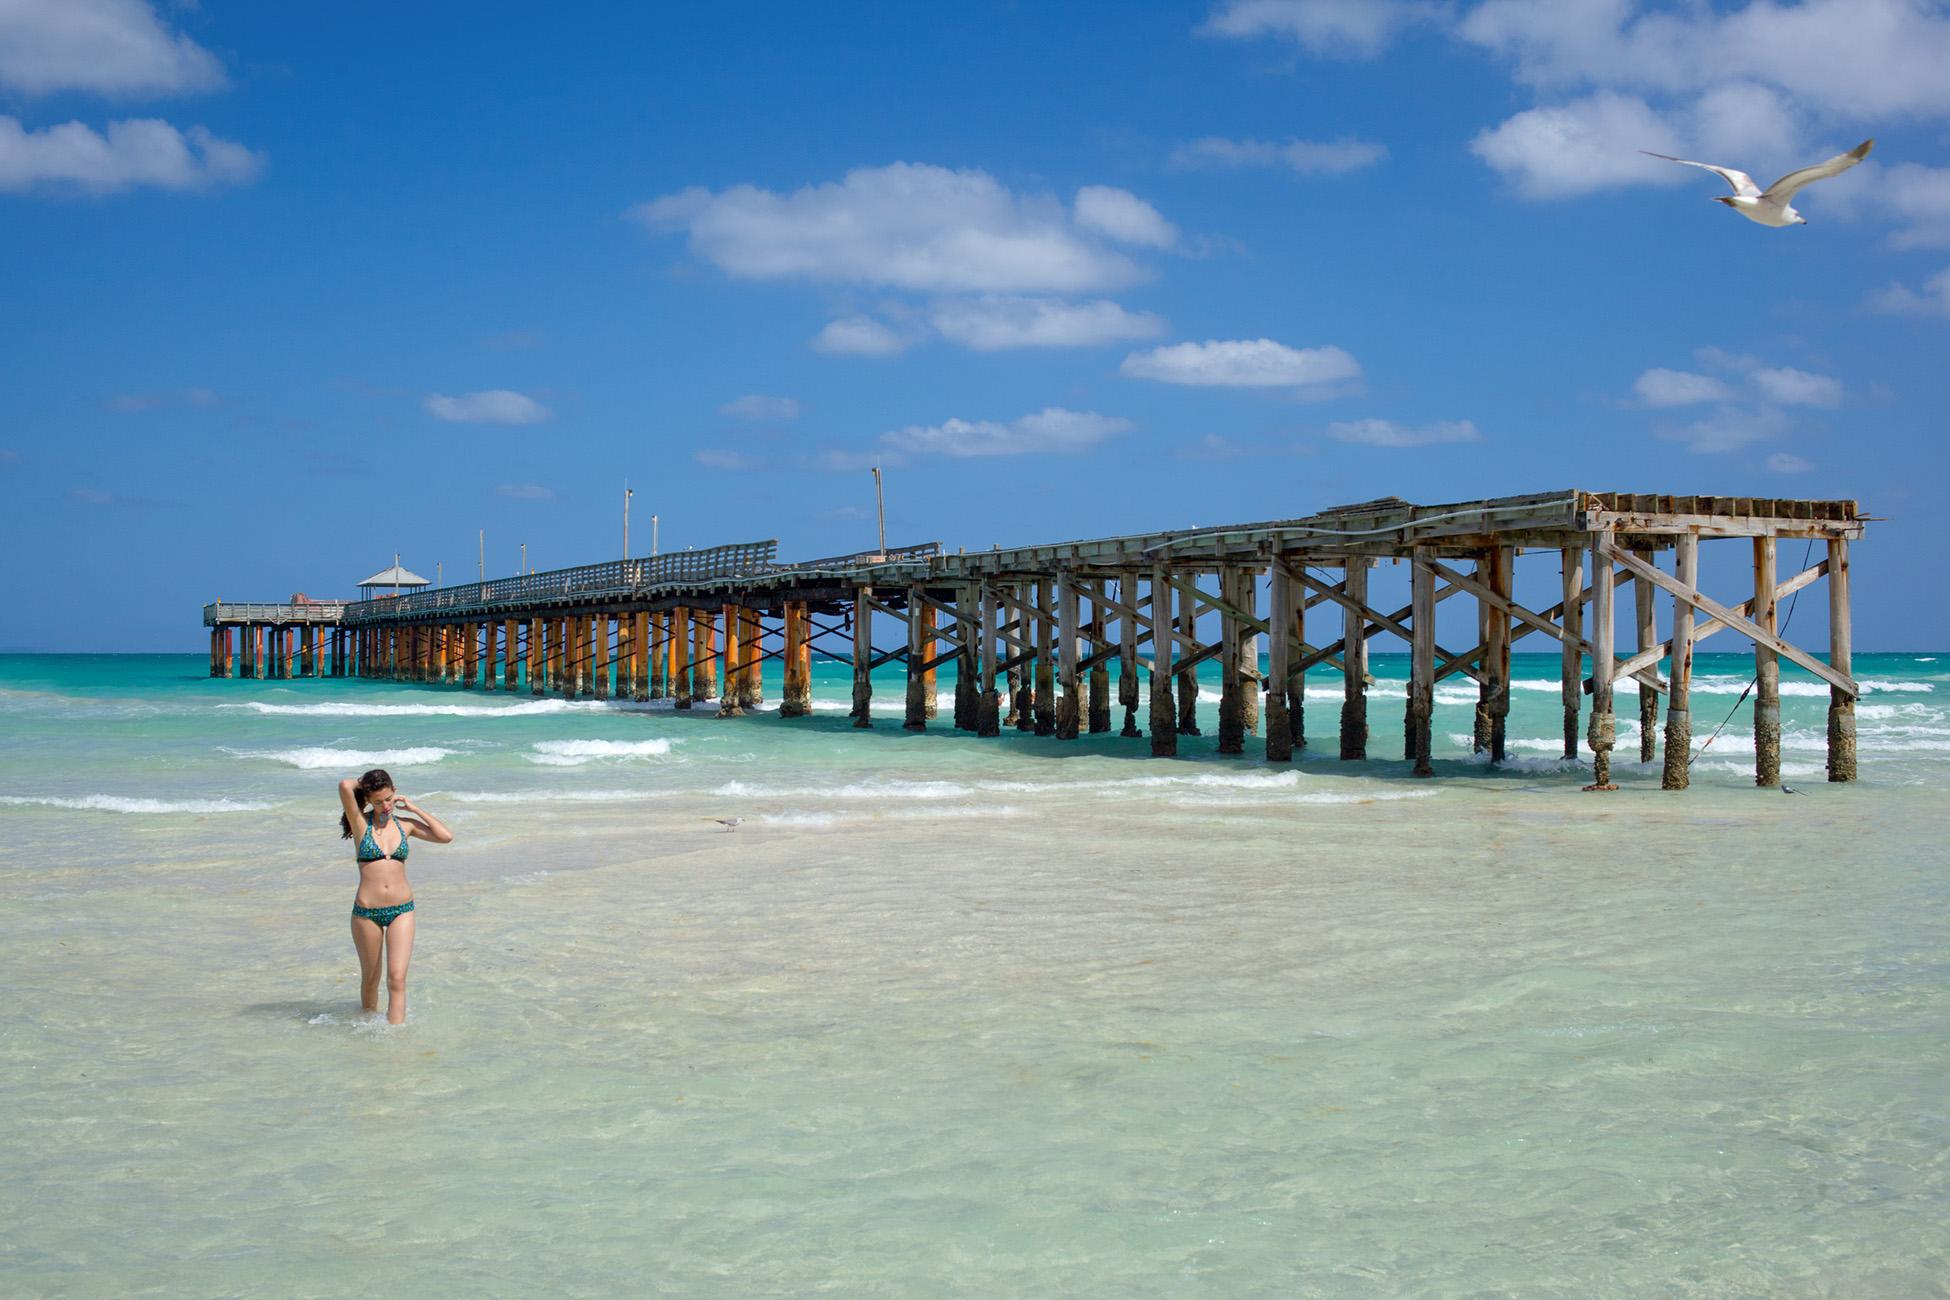 Sunny Isles, Florida by photographer Thomas Kachadurian